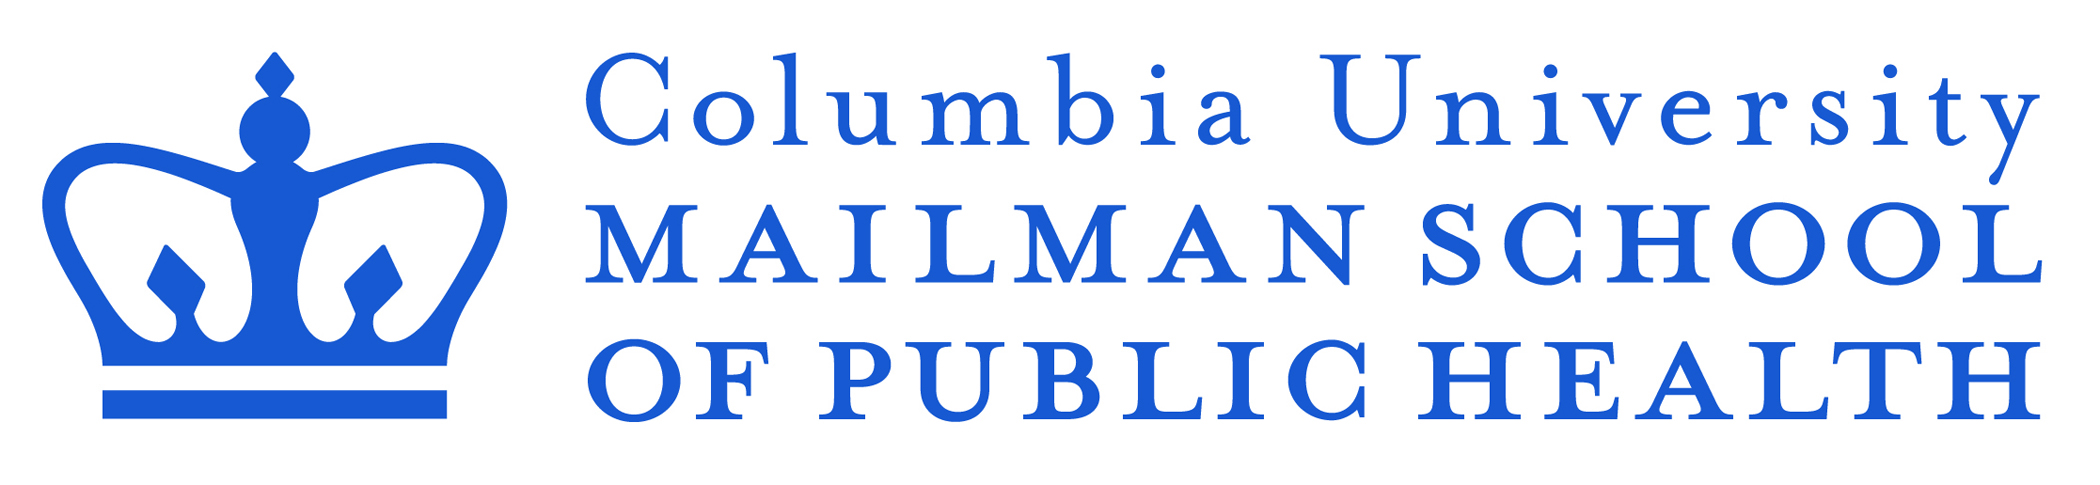 Columbia-Mailman-school-logo.jpeg